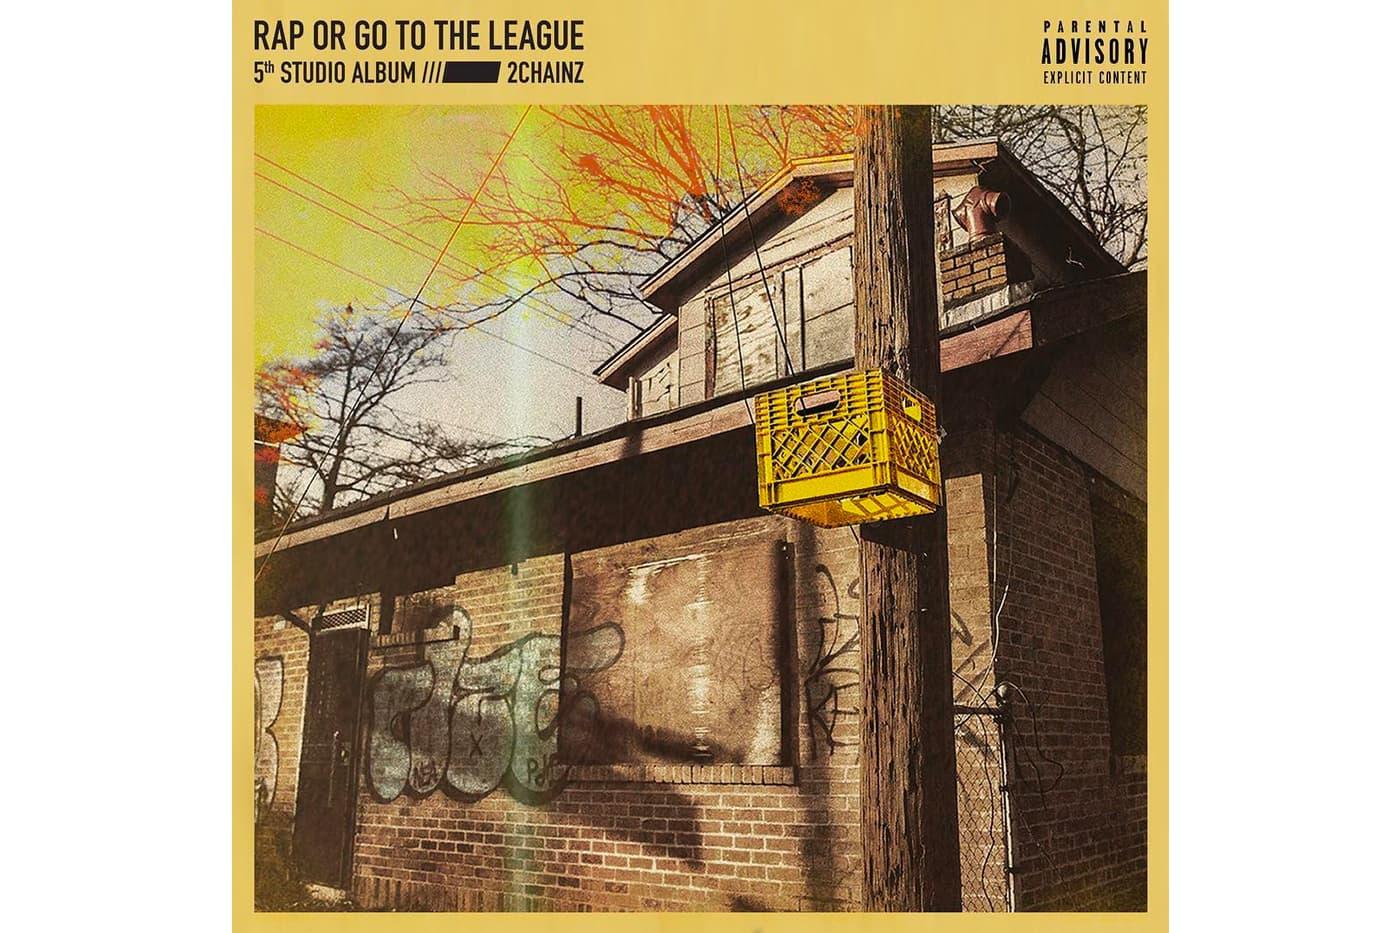 2 Chainz - Rap or Go to the League Album (Zip Download)